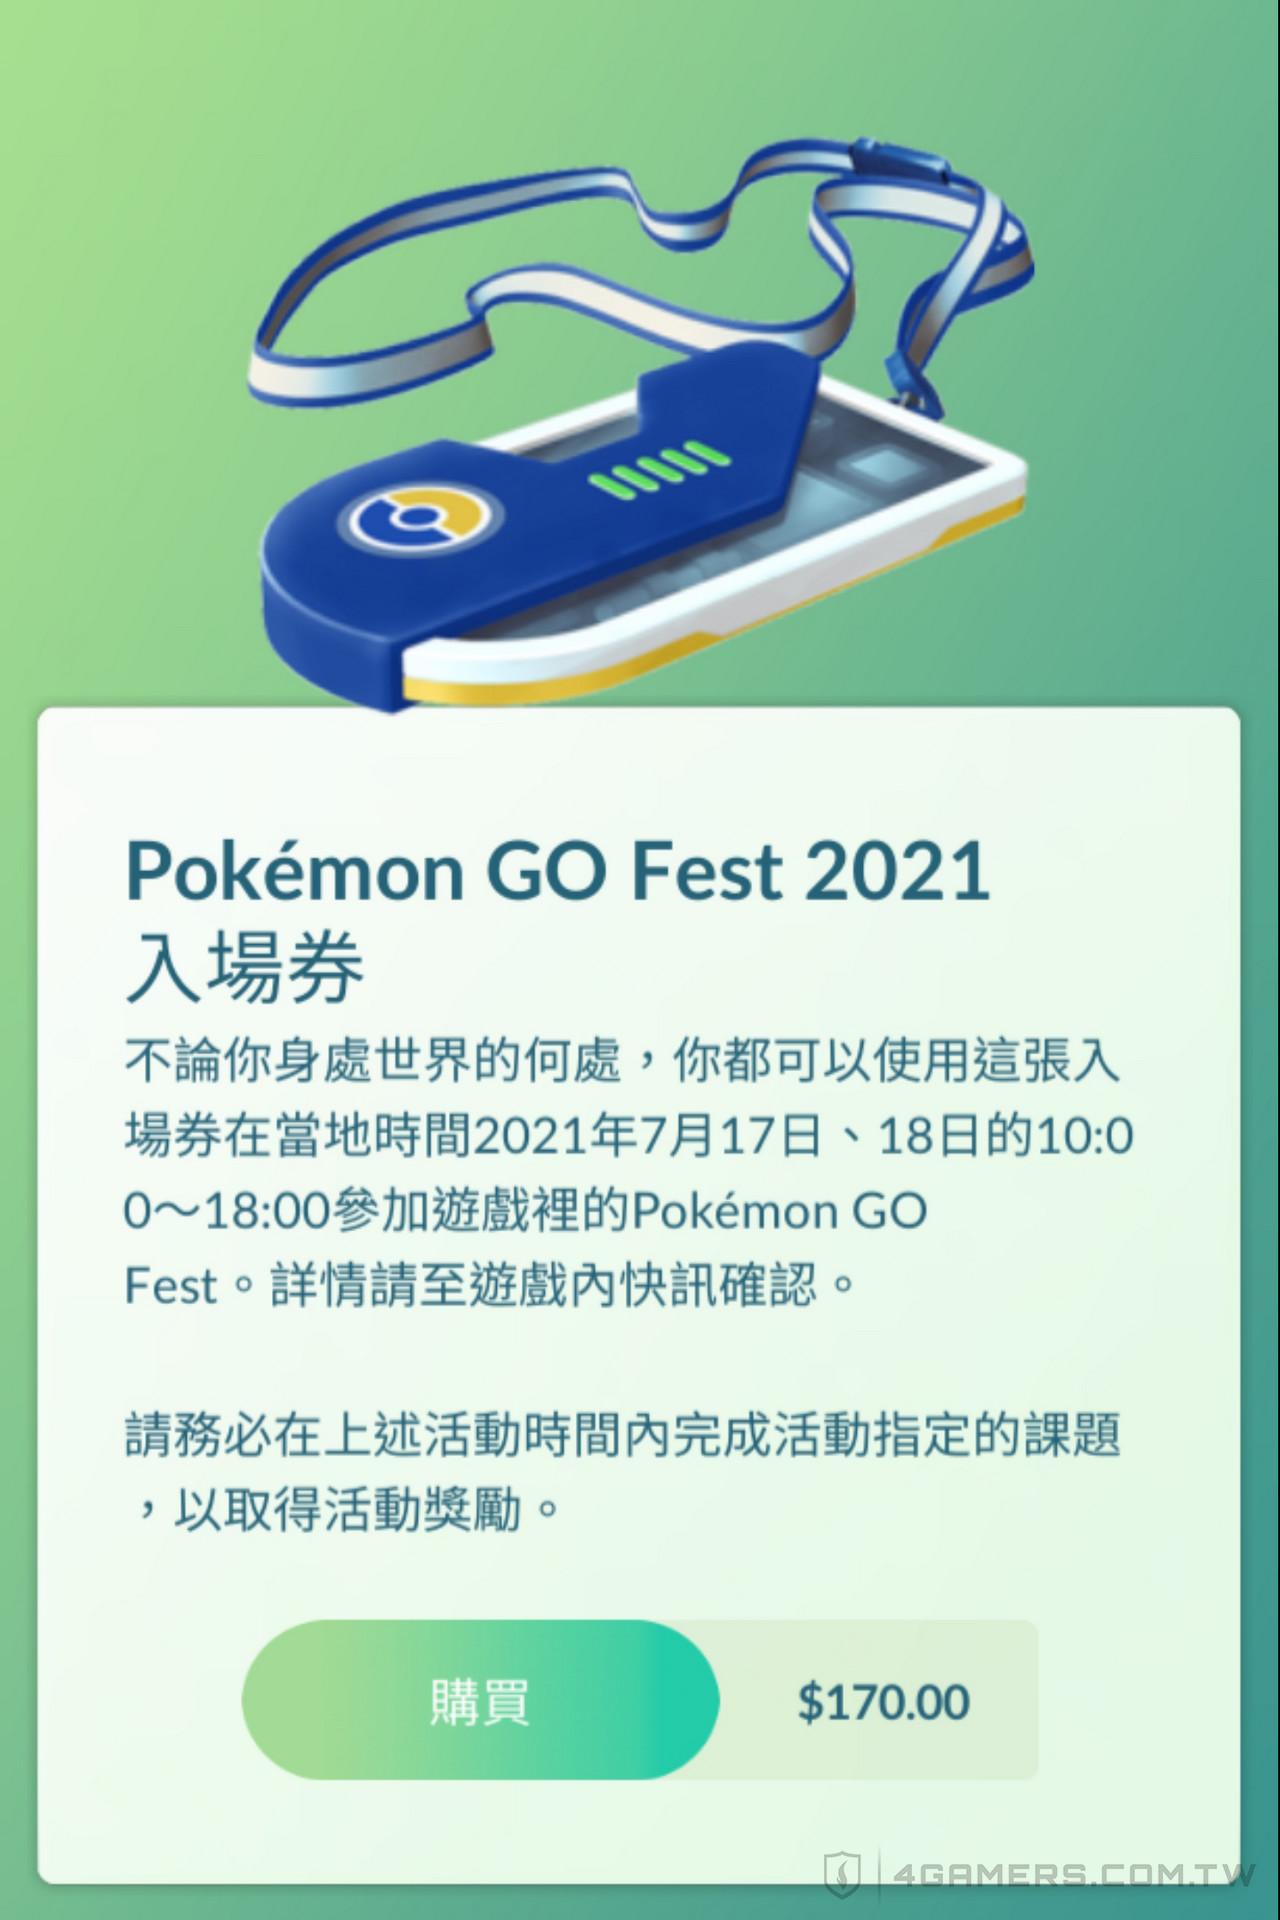 Pokemon GO Fest 2021 Ticket